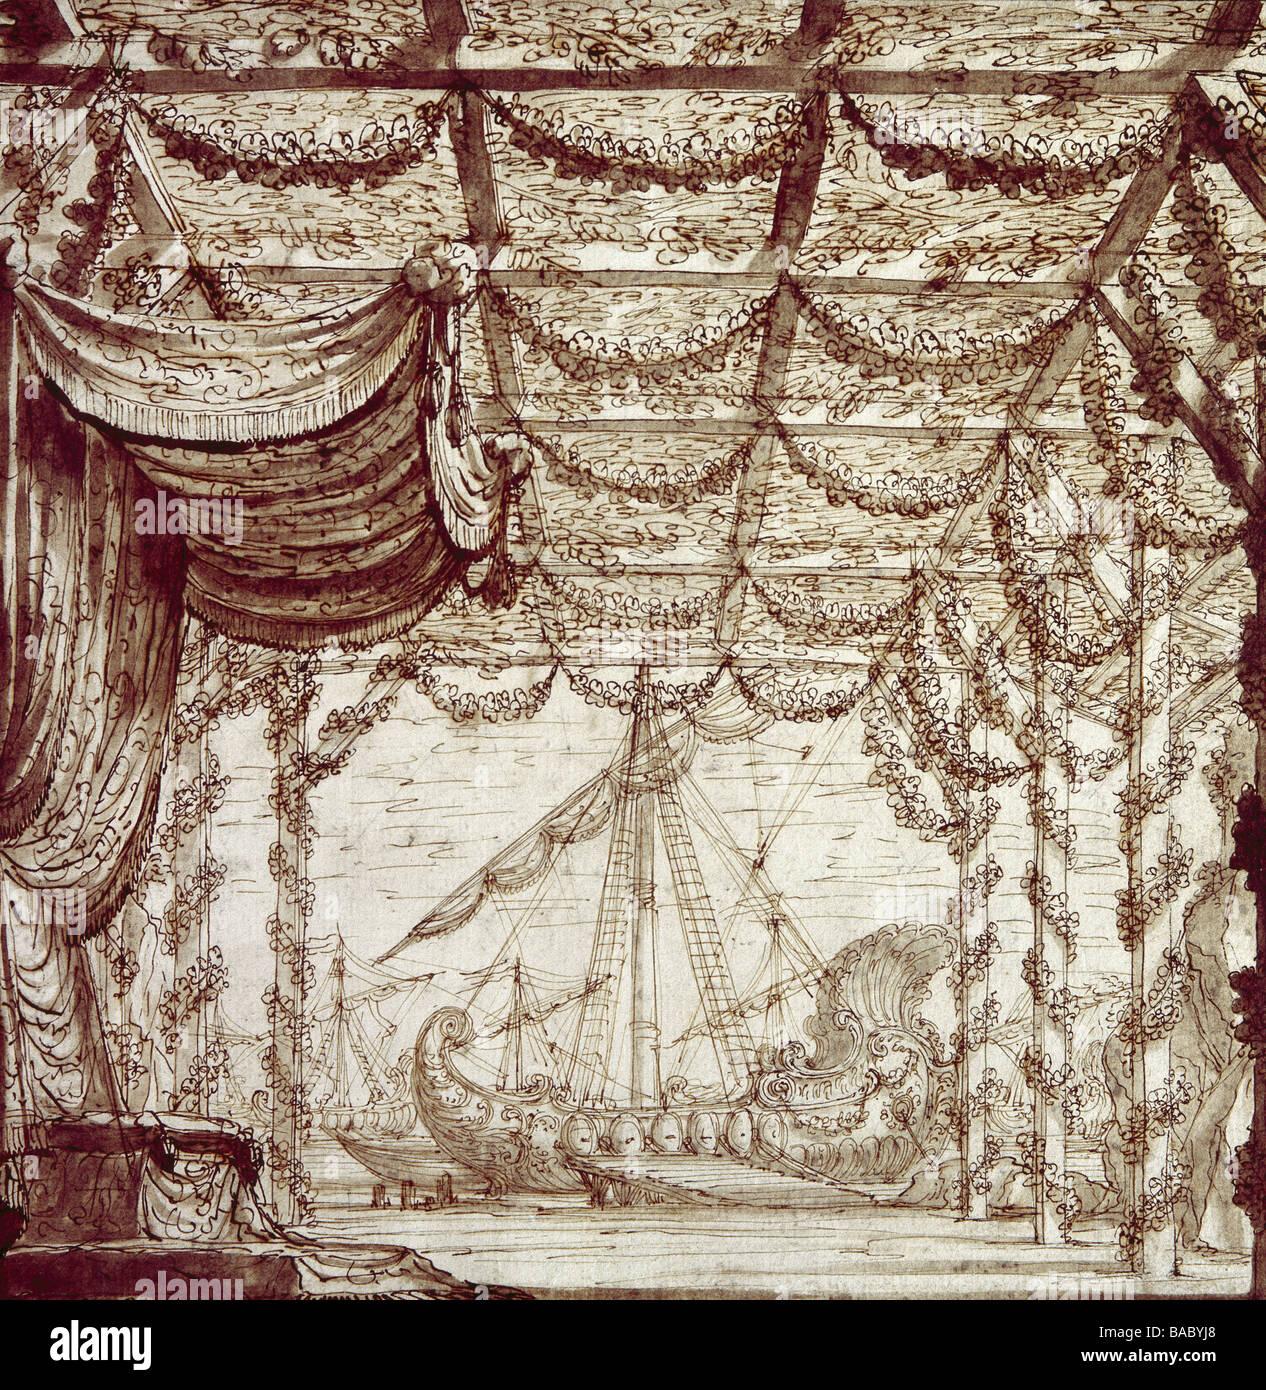 Theatre Stage Design Decoration By Giuseppe Galli Bibiena